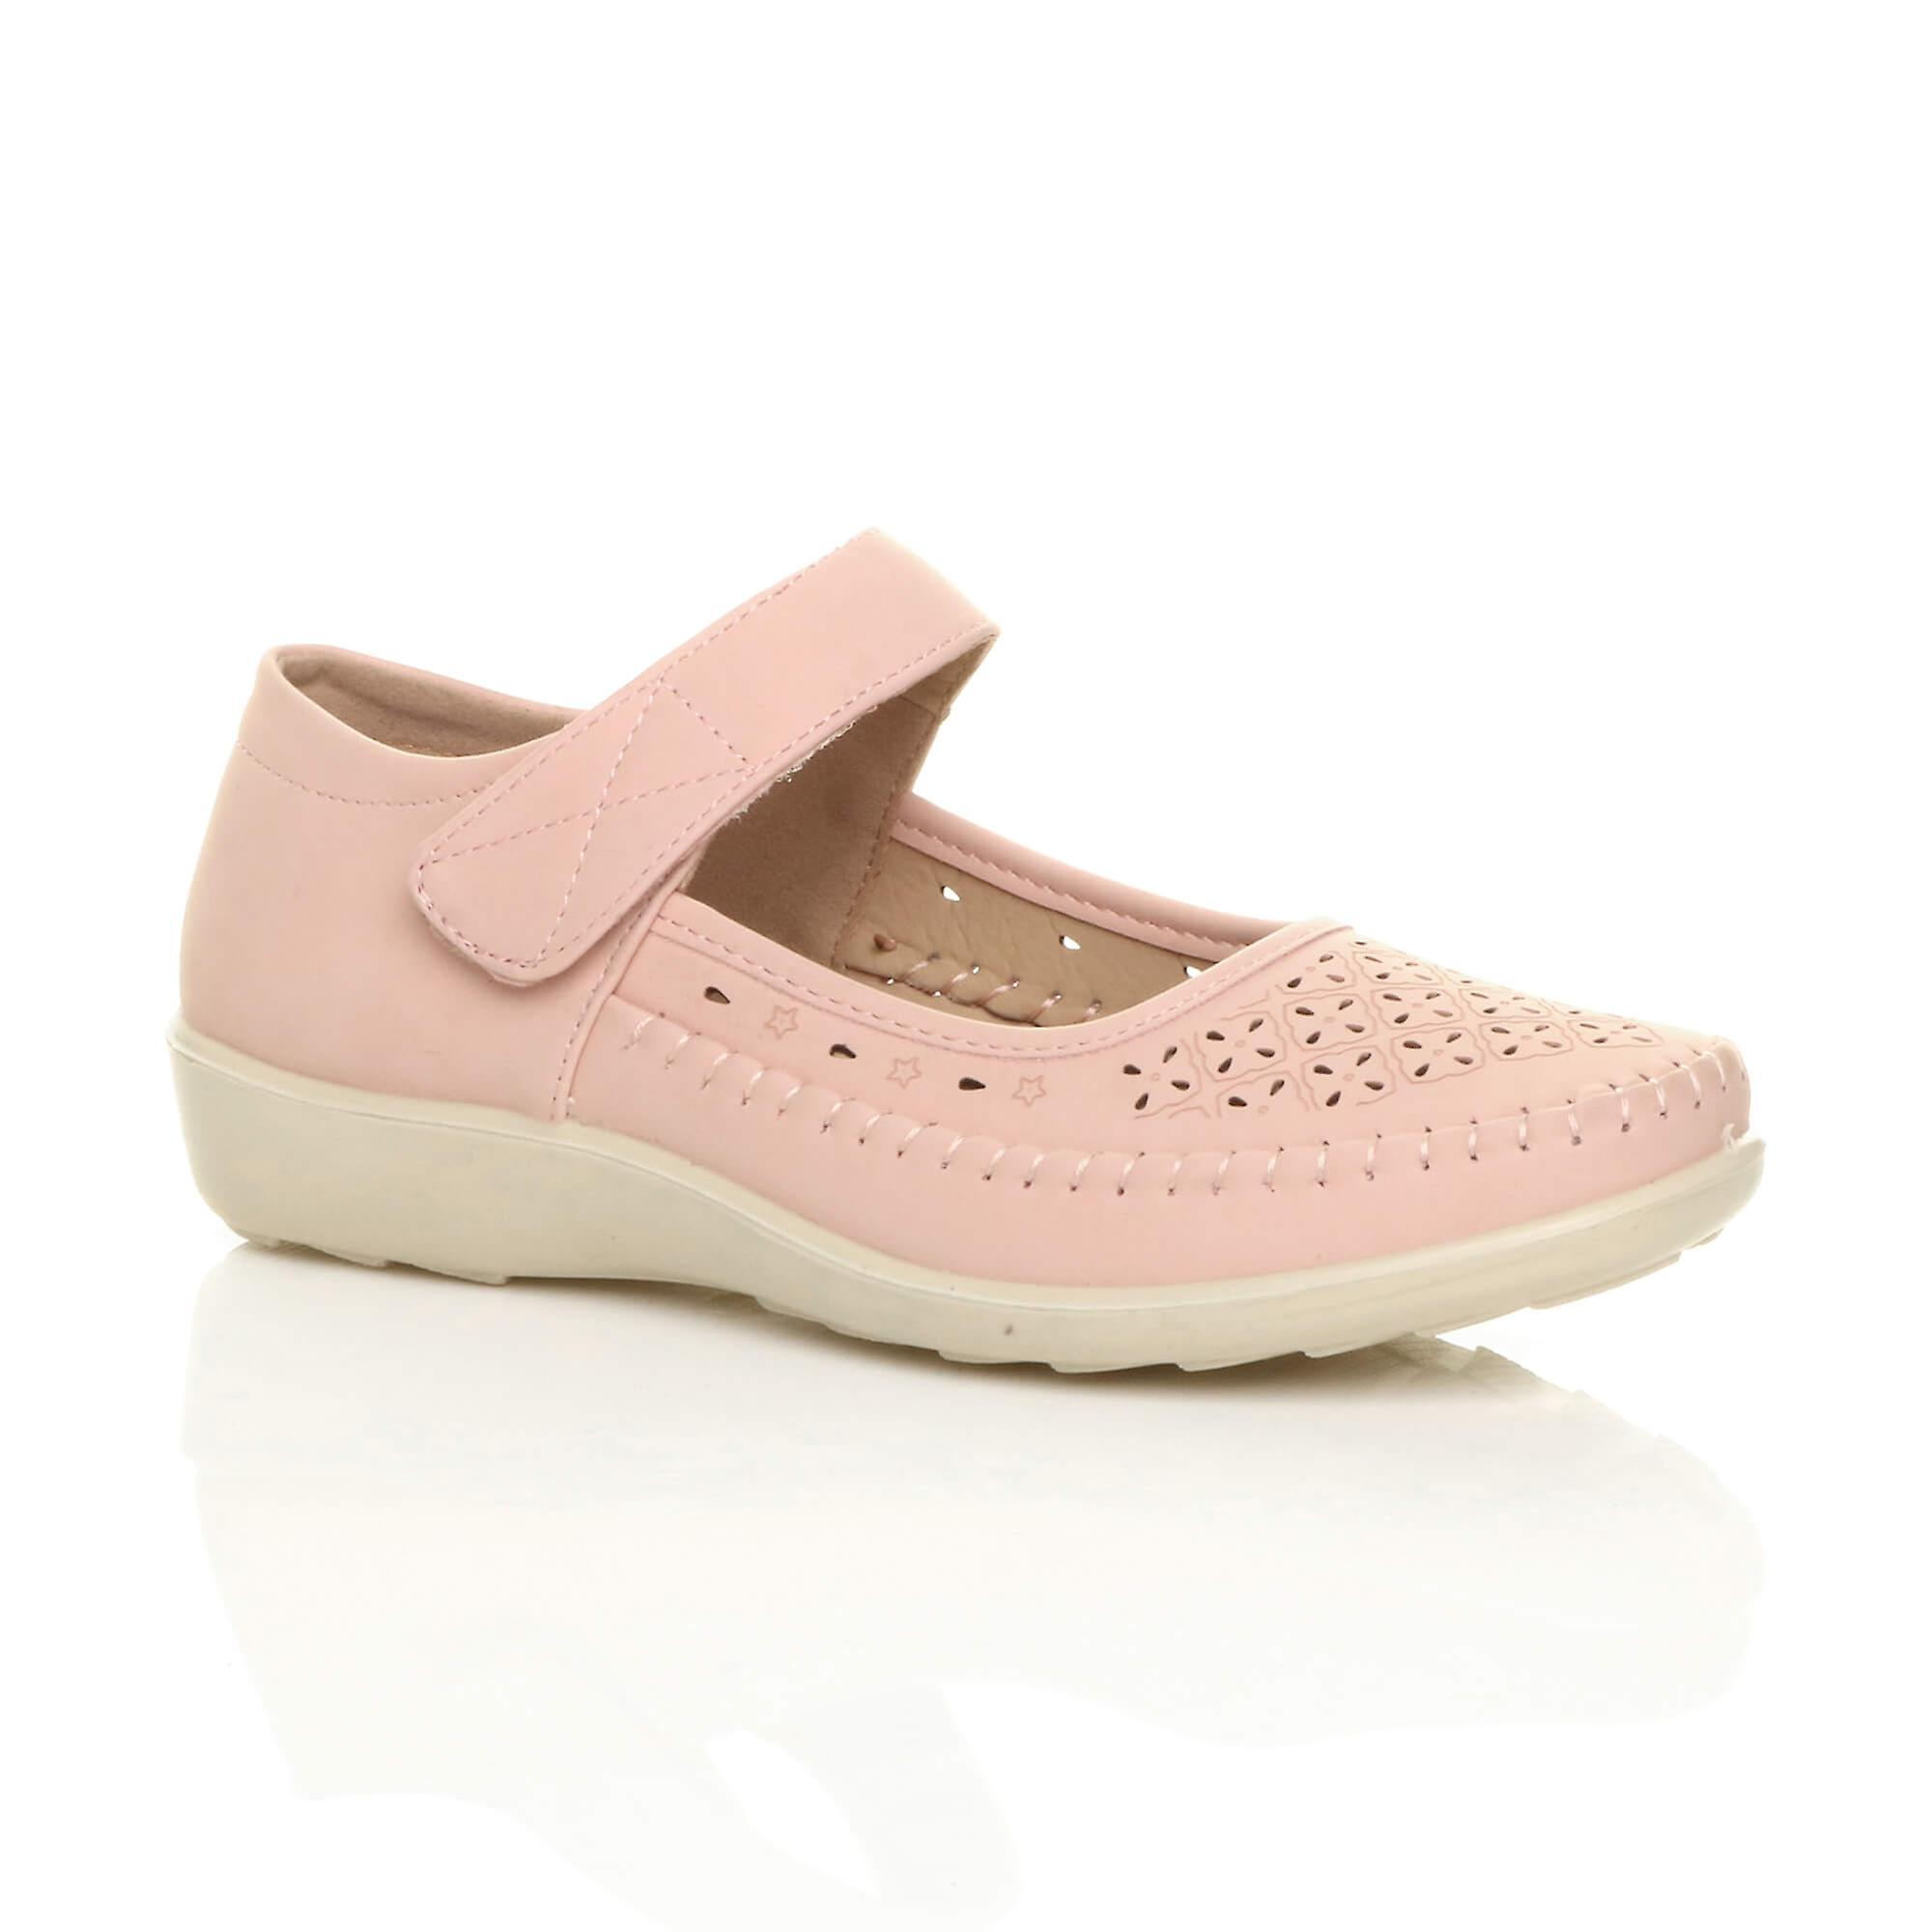 Ajvani womens flat grip sole mary jane hook & loop padded cushioned comfort shoes